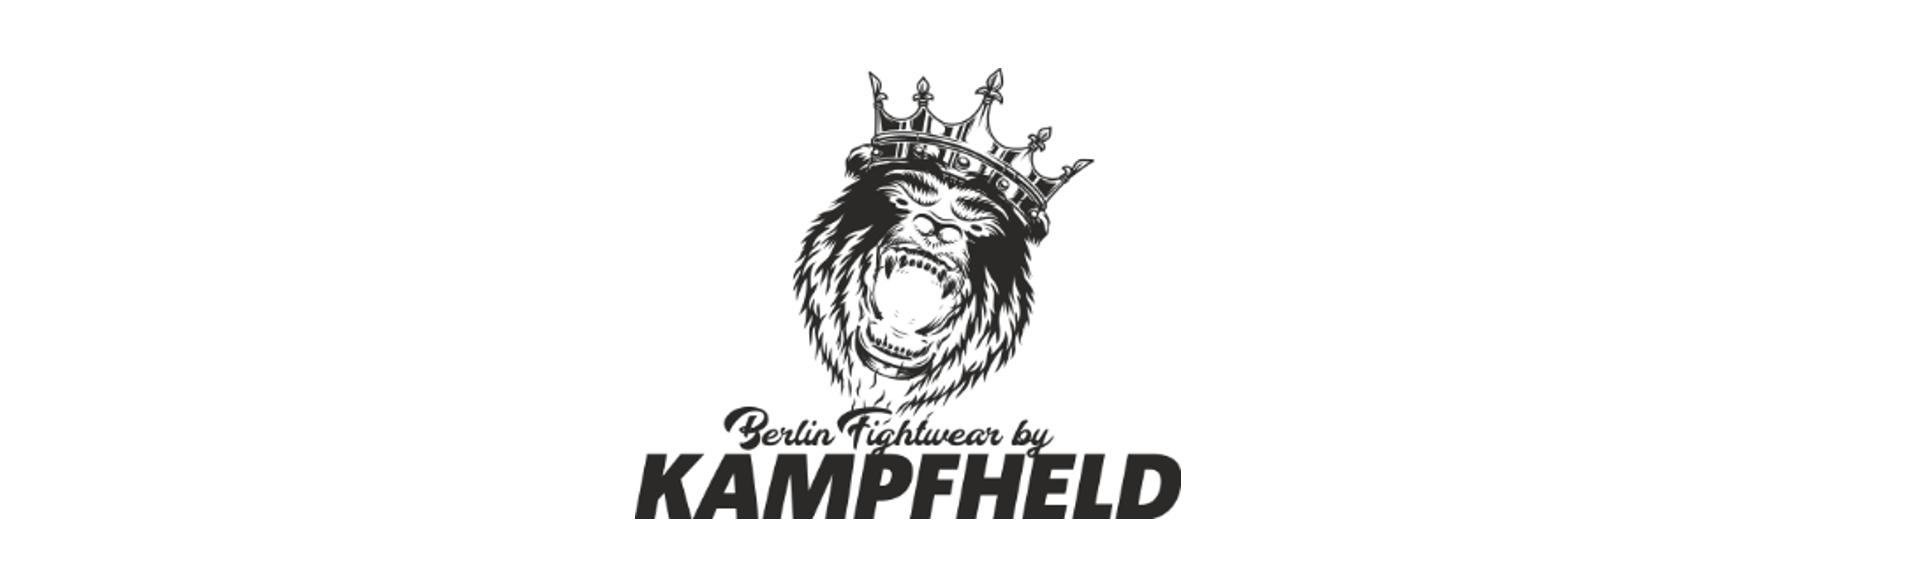 KAMPFHELD